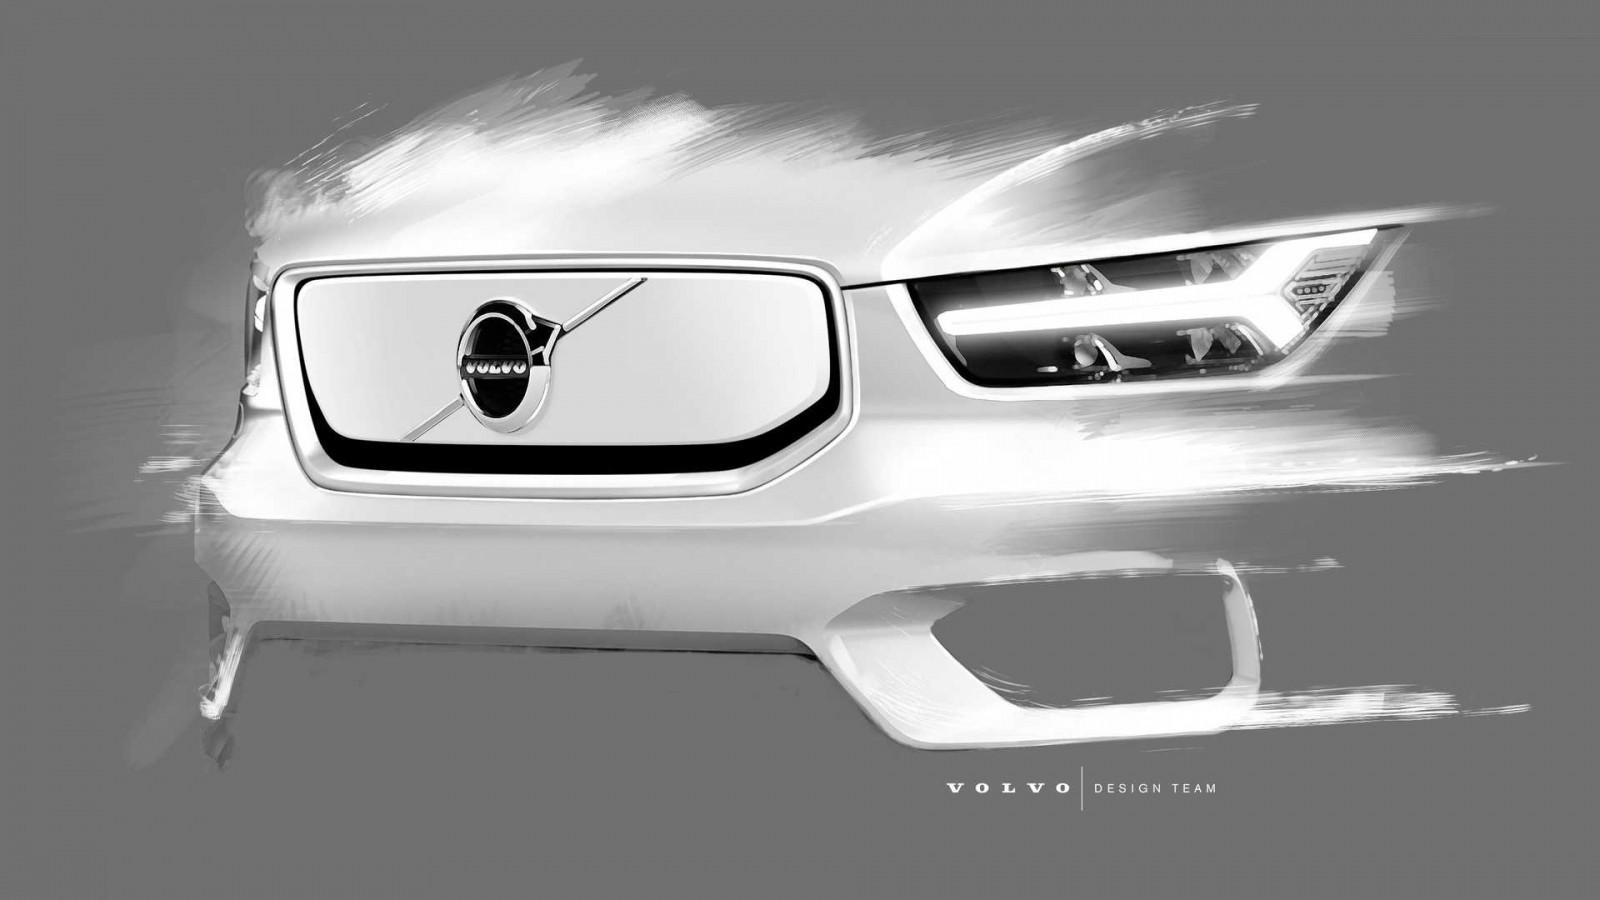 Первый электрокар Volvo показал багажник под капотом